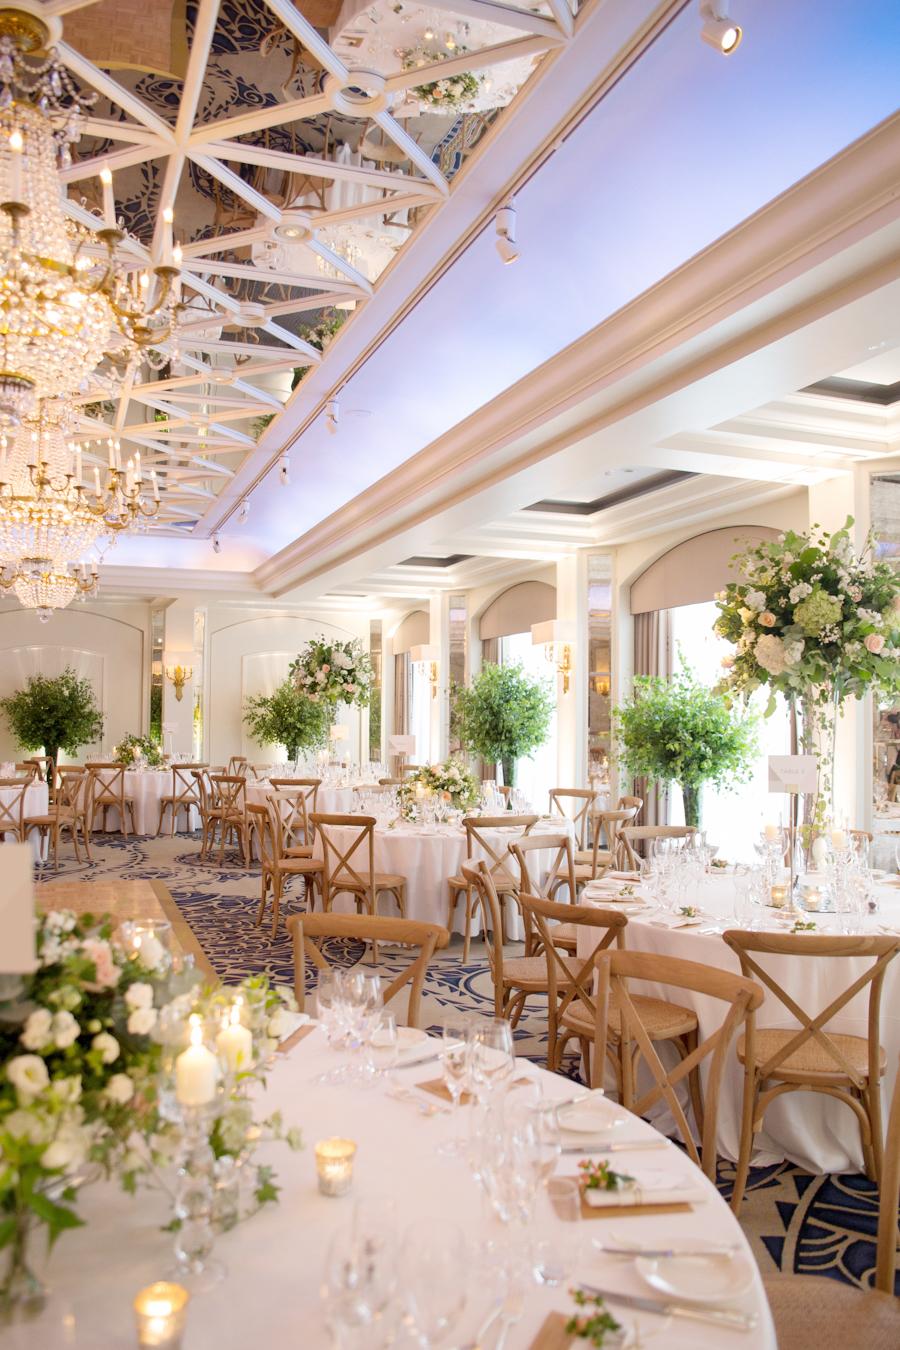 Copy of The Berkeley Wedding | Luxury Wedding Planner | Lamare London